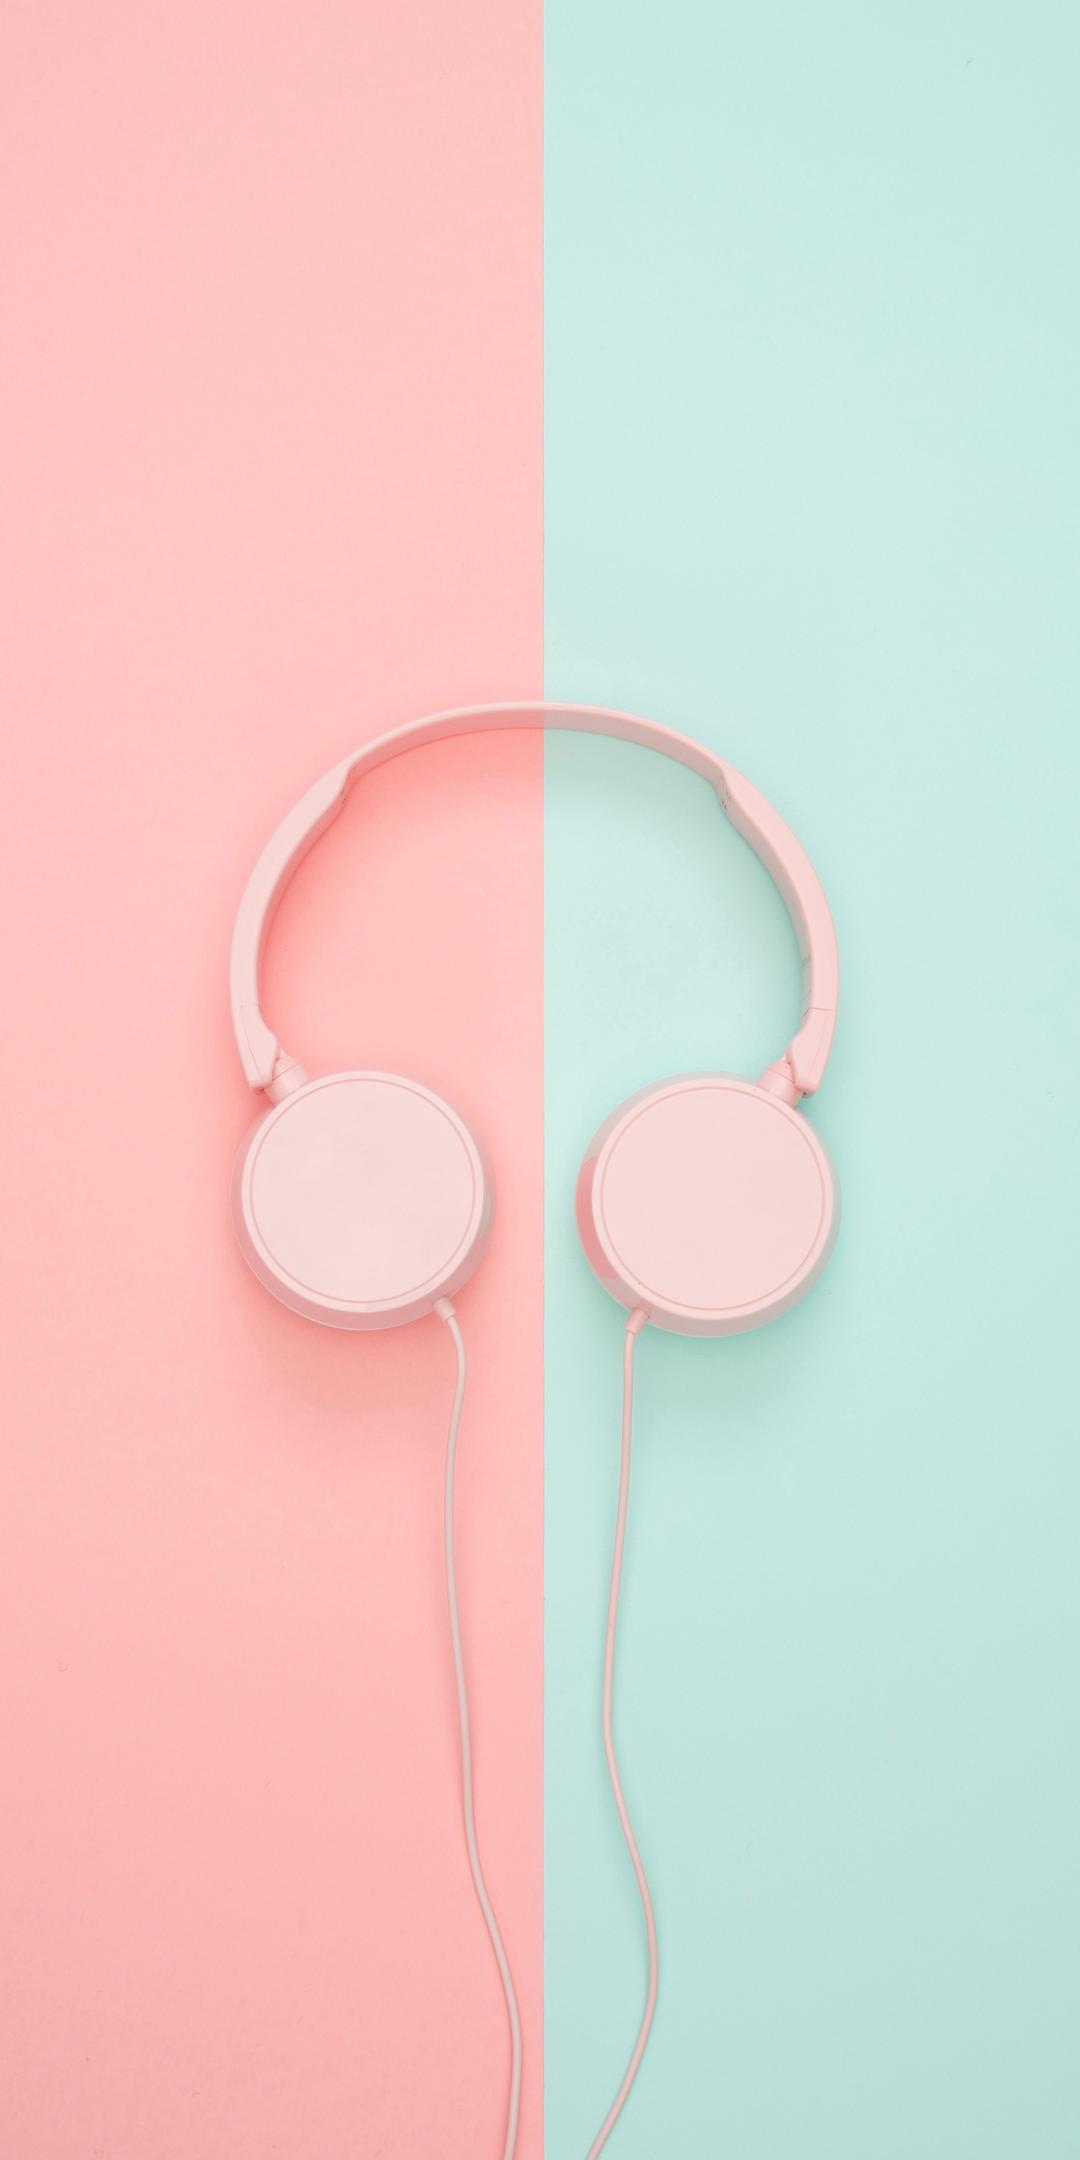 5e67b897a4158 - 粉色系少女心手机壁纸